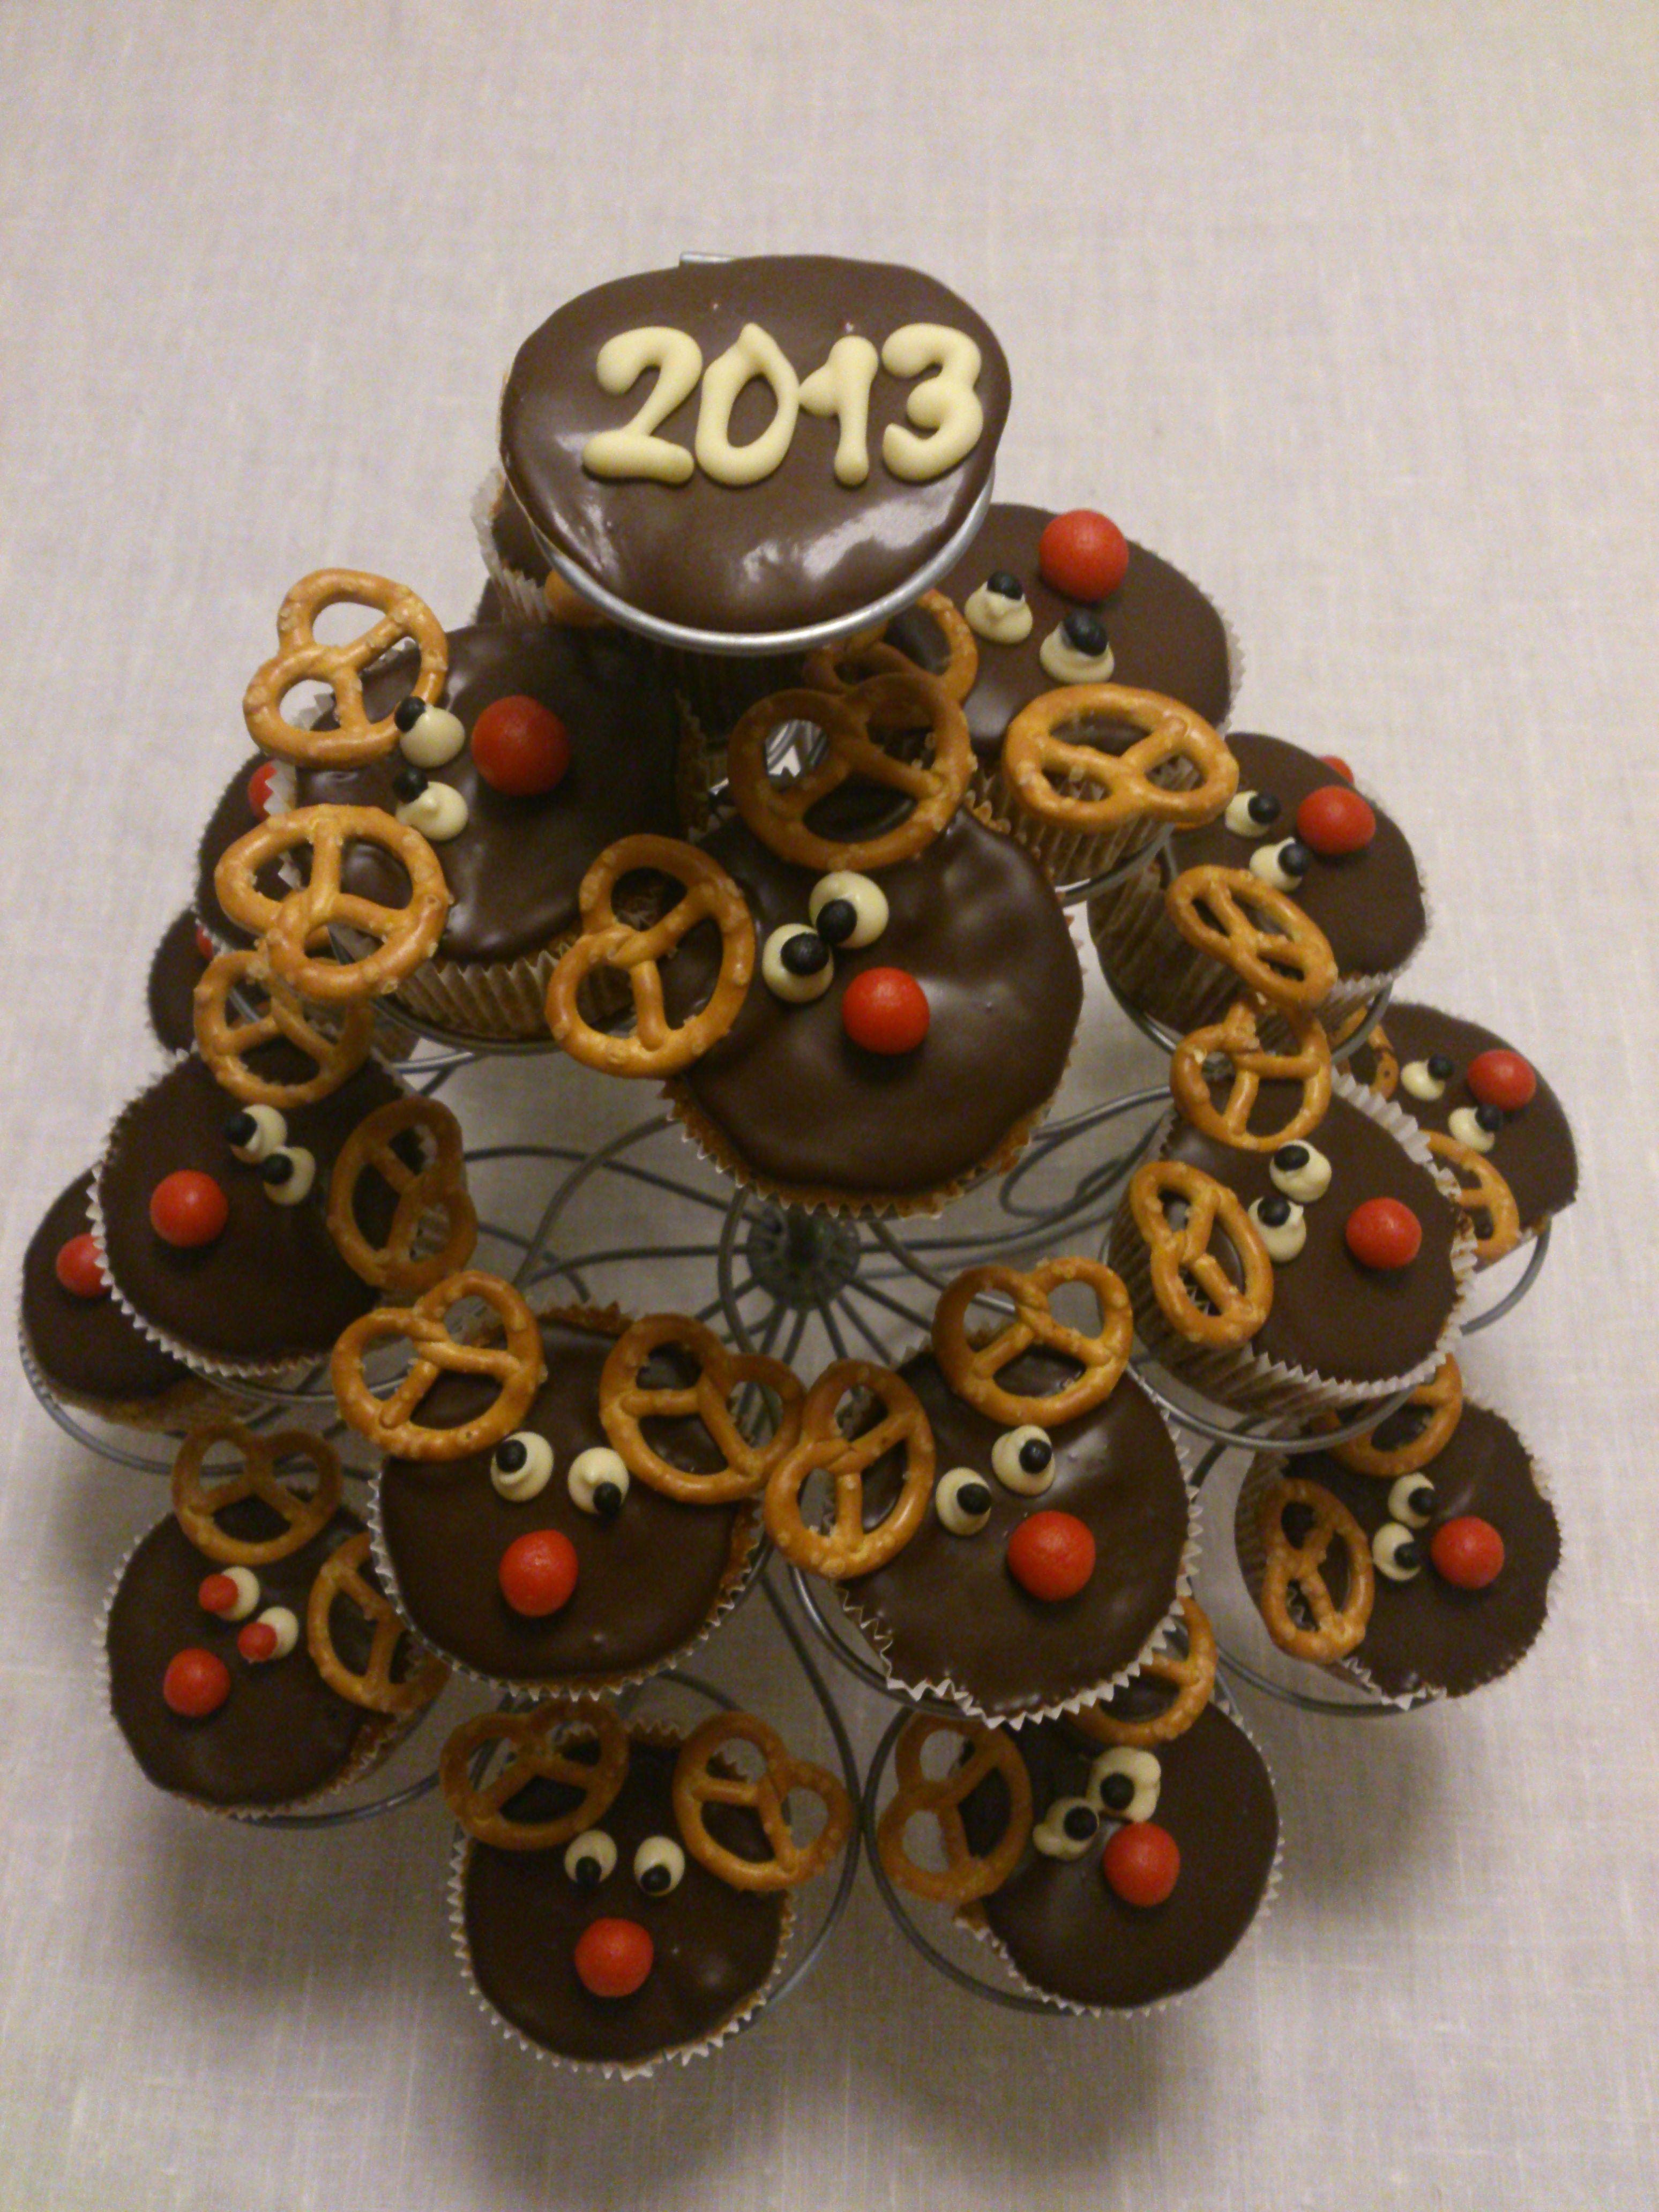 Rudolfovi muffini / Rudolph's cupcakes